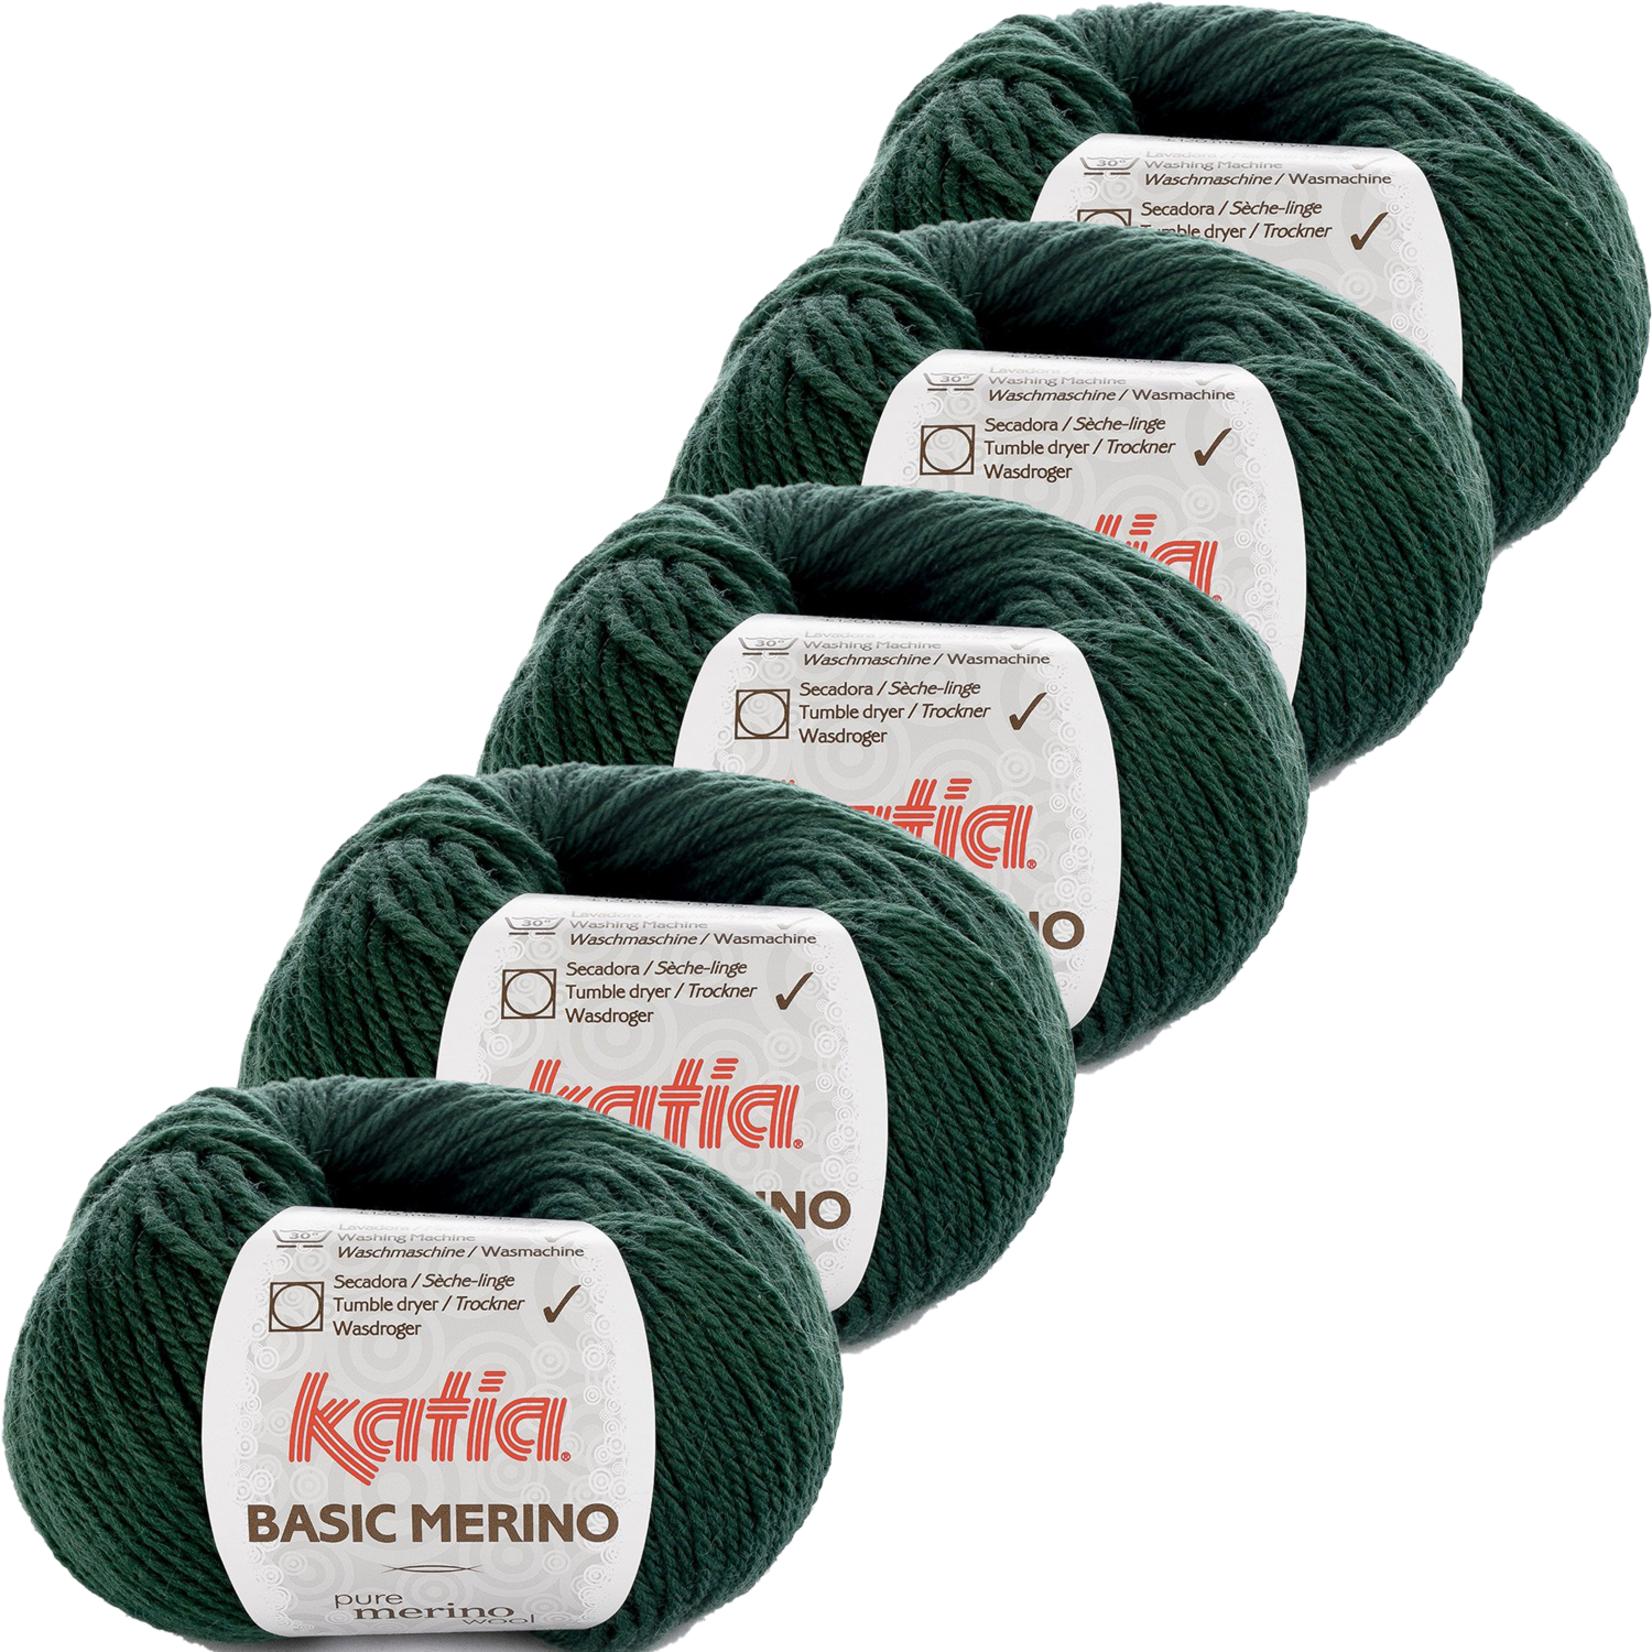 Katia Basic Merino - kleur 15_Zeer donker groen - bundel 5 bollen 50 gr.  van 120 m.